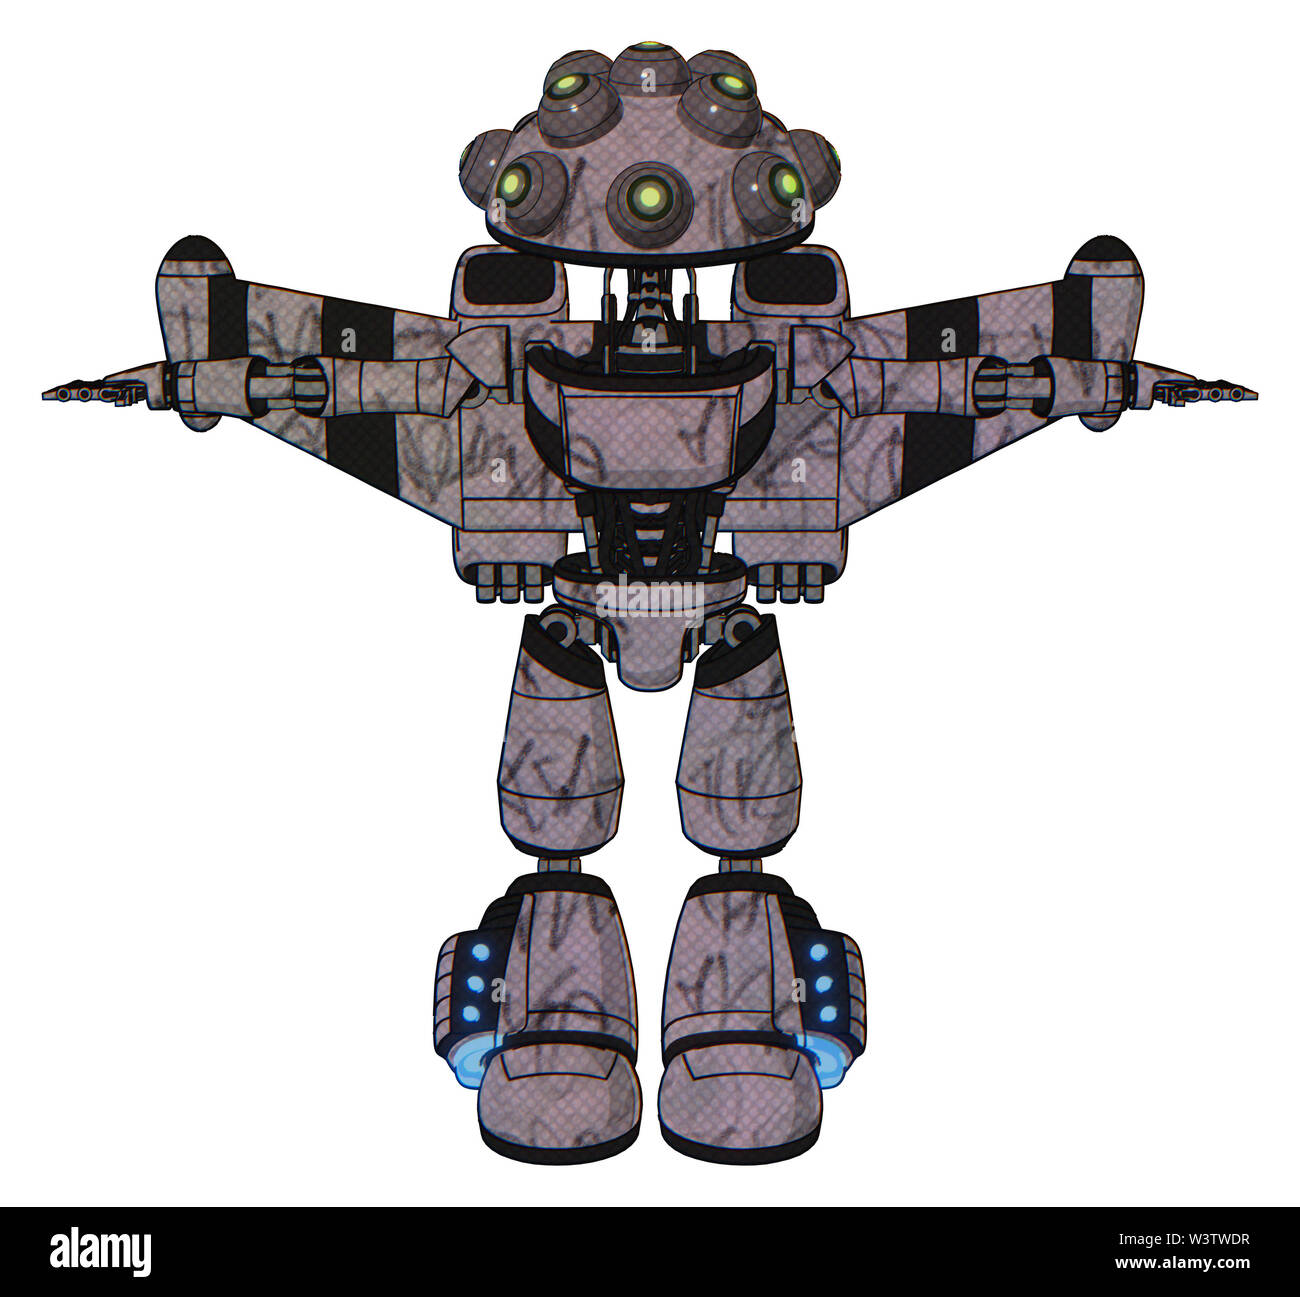 Automaton containing elements: many robo-eye domehead design, light chest exoshielding, ultralight chest exosuit, stellar jet wing rocket pack, light - Stock Image